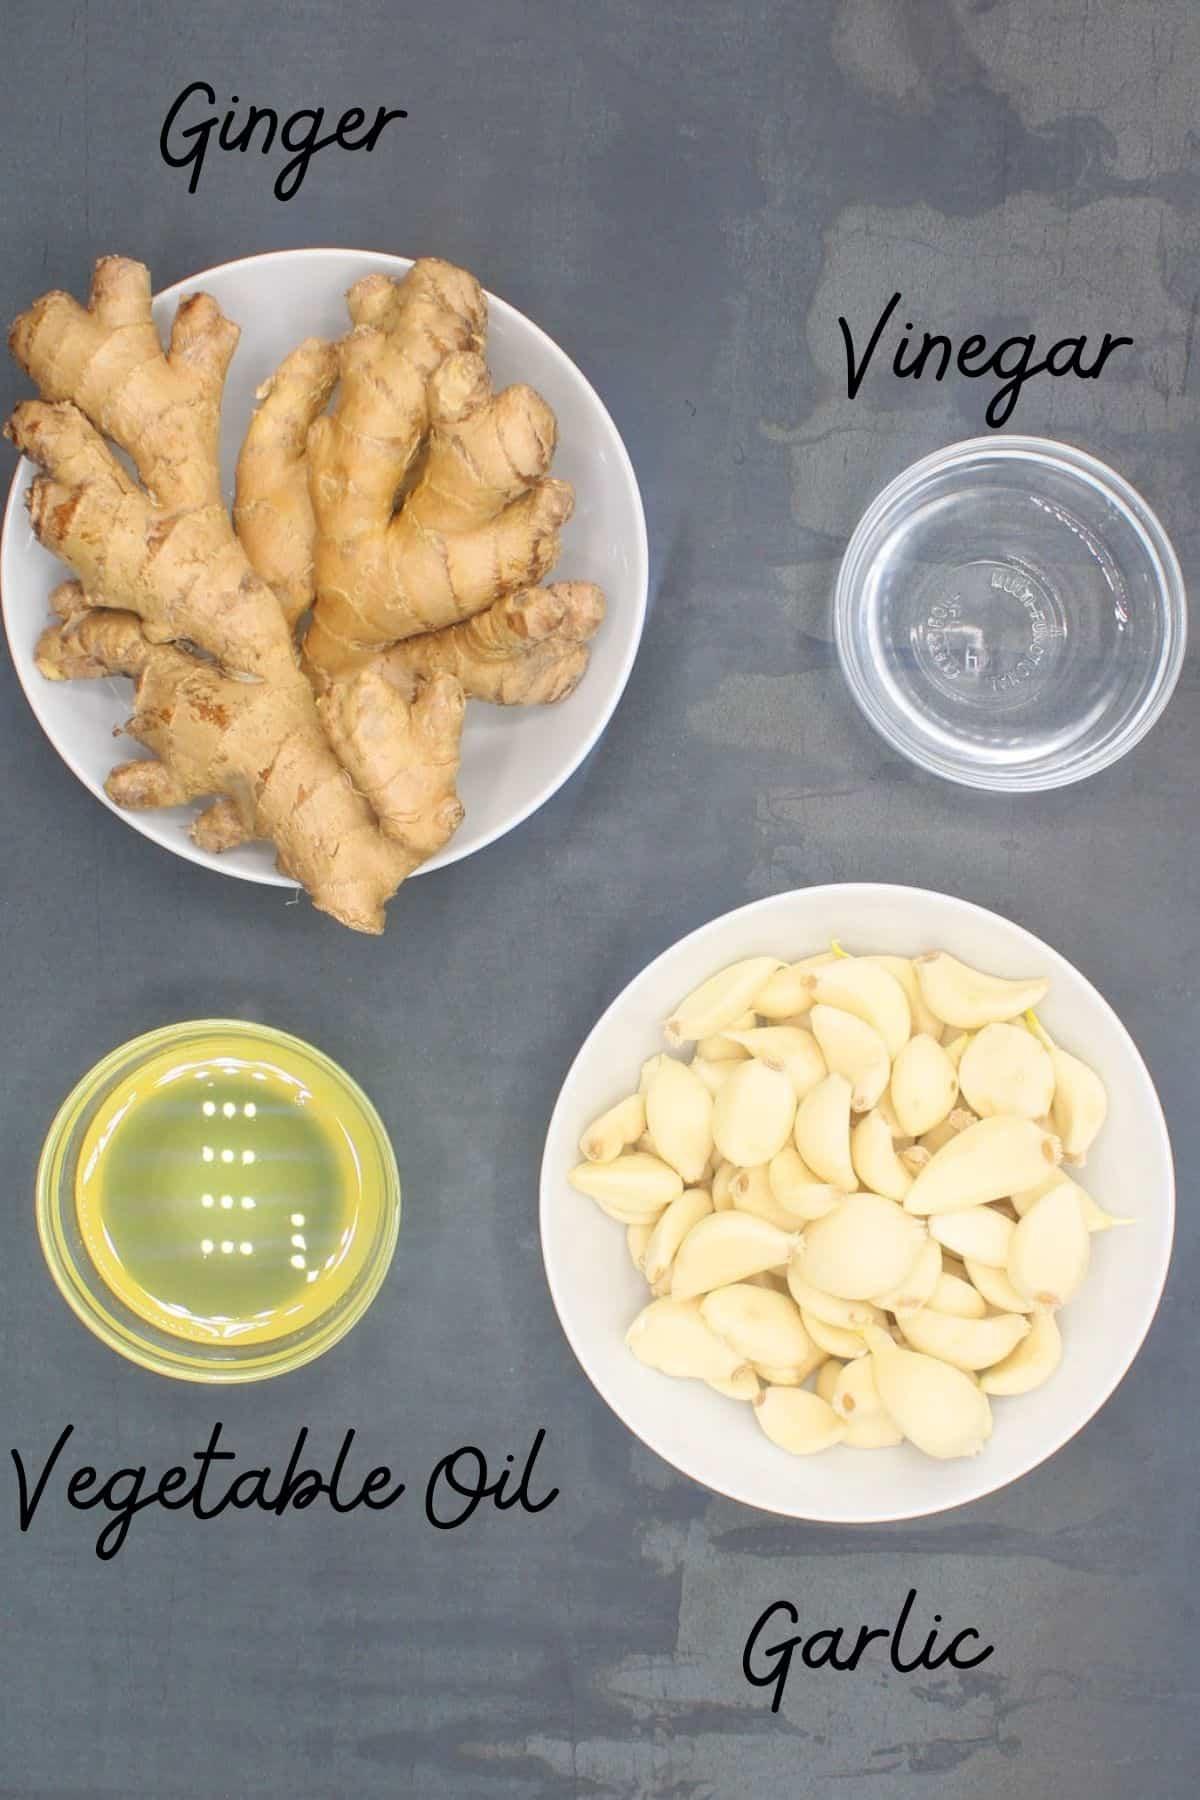 Photo showing ingredients used to make ginger garlic paste, including gingerroot, garlic, vegetable oil and vinegar.